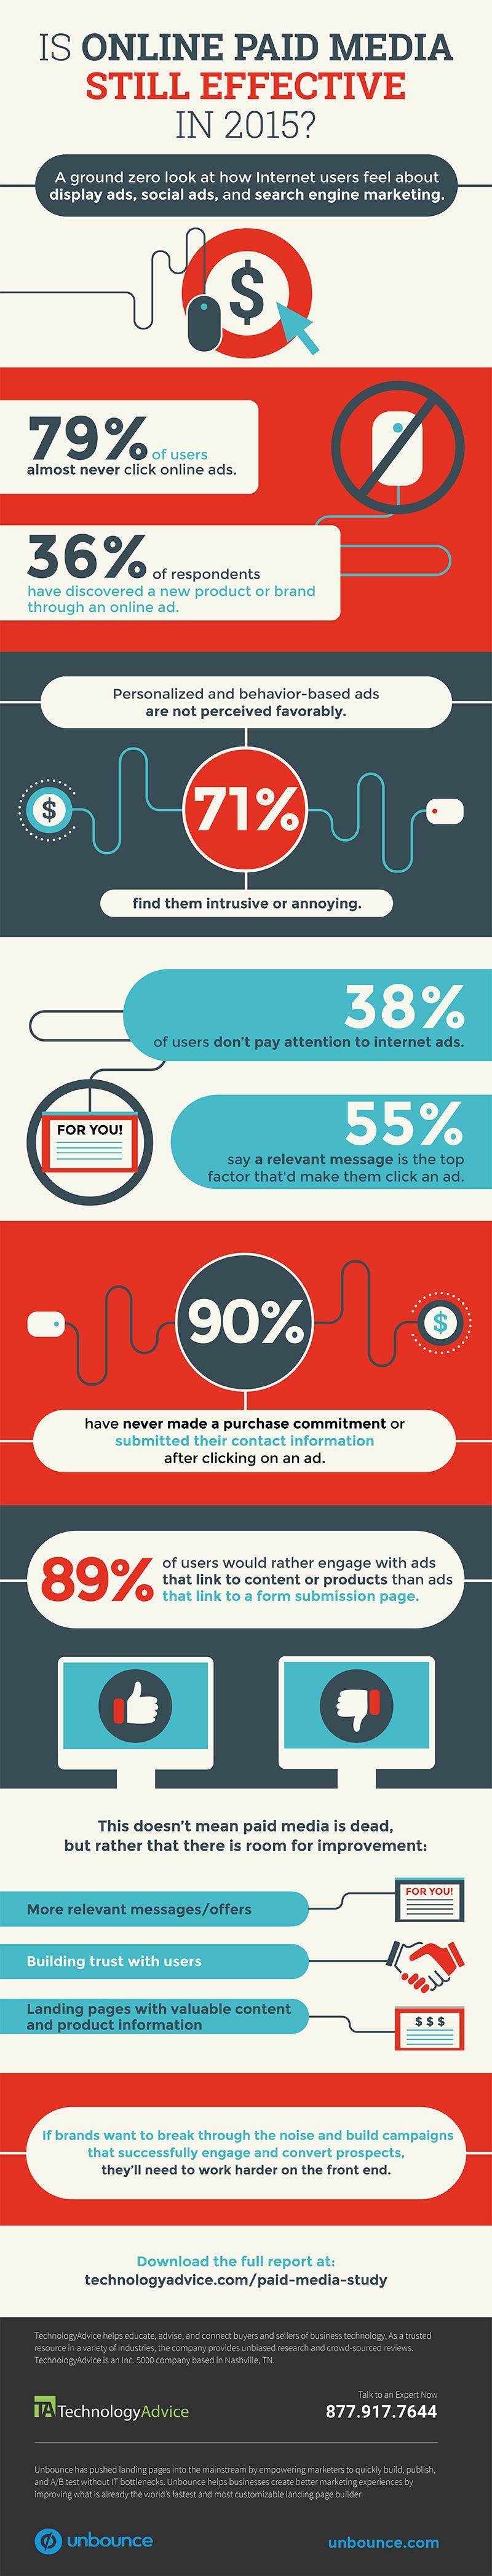 technologyadvice-ppc-infographic-v4